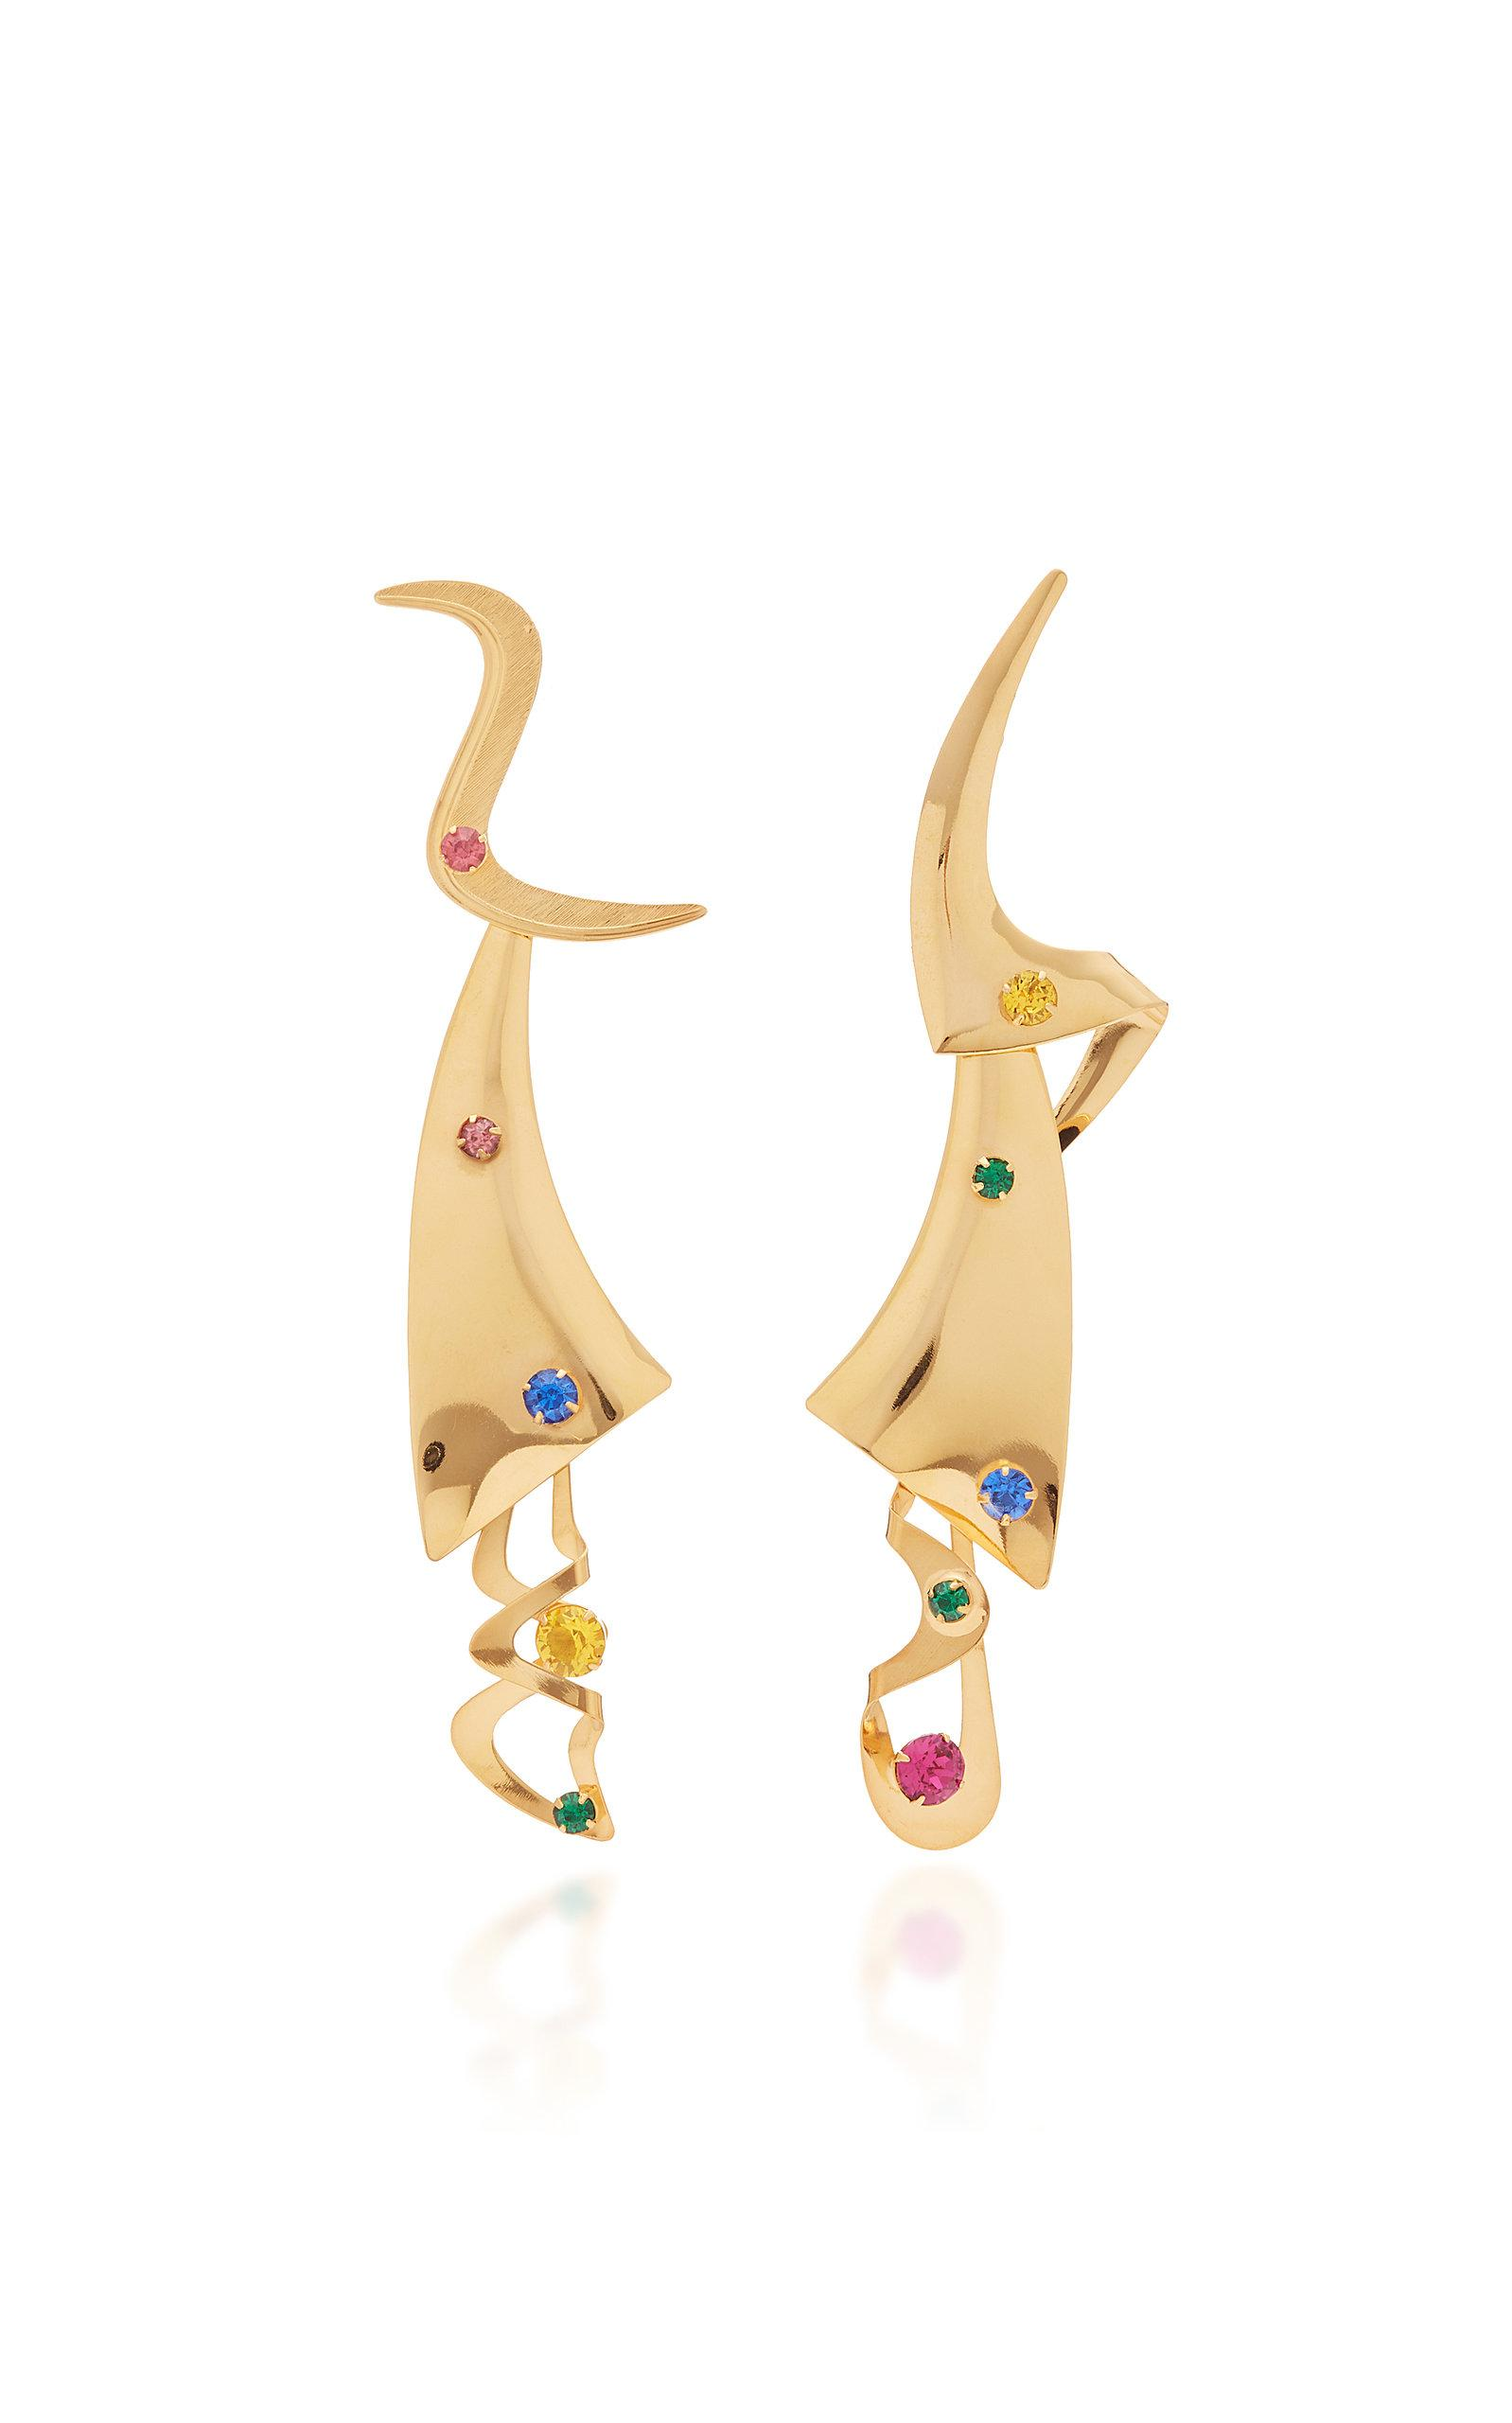 Rodarte Gold Modern Shapes Earring With Swarovski Crystals